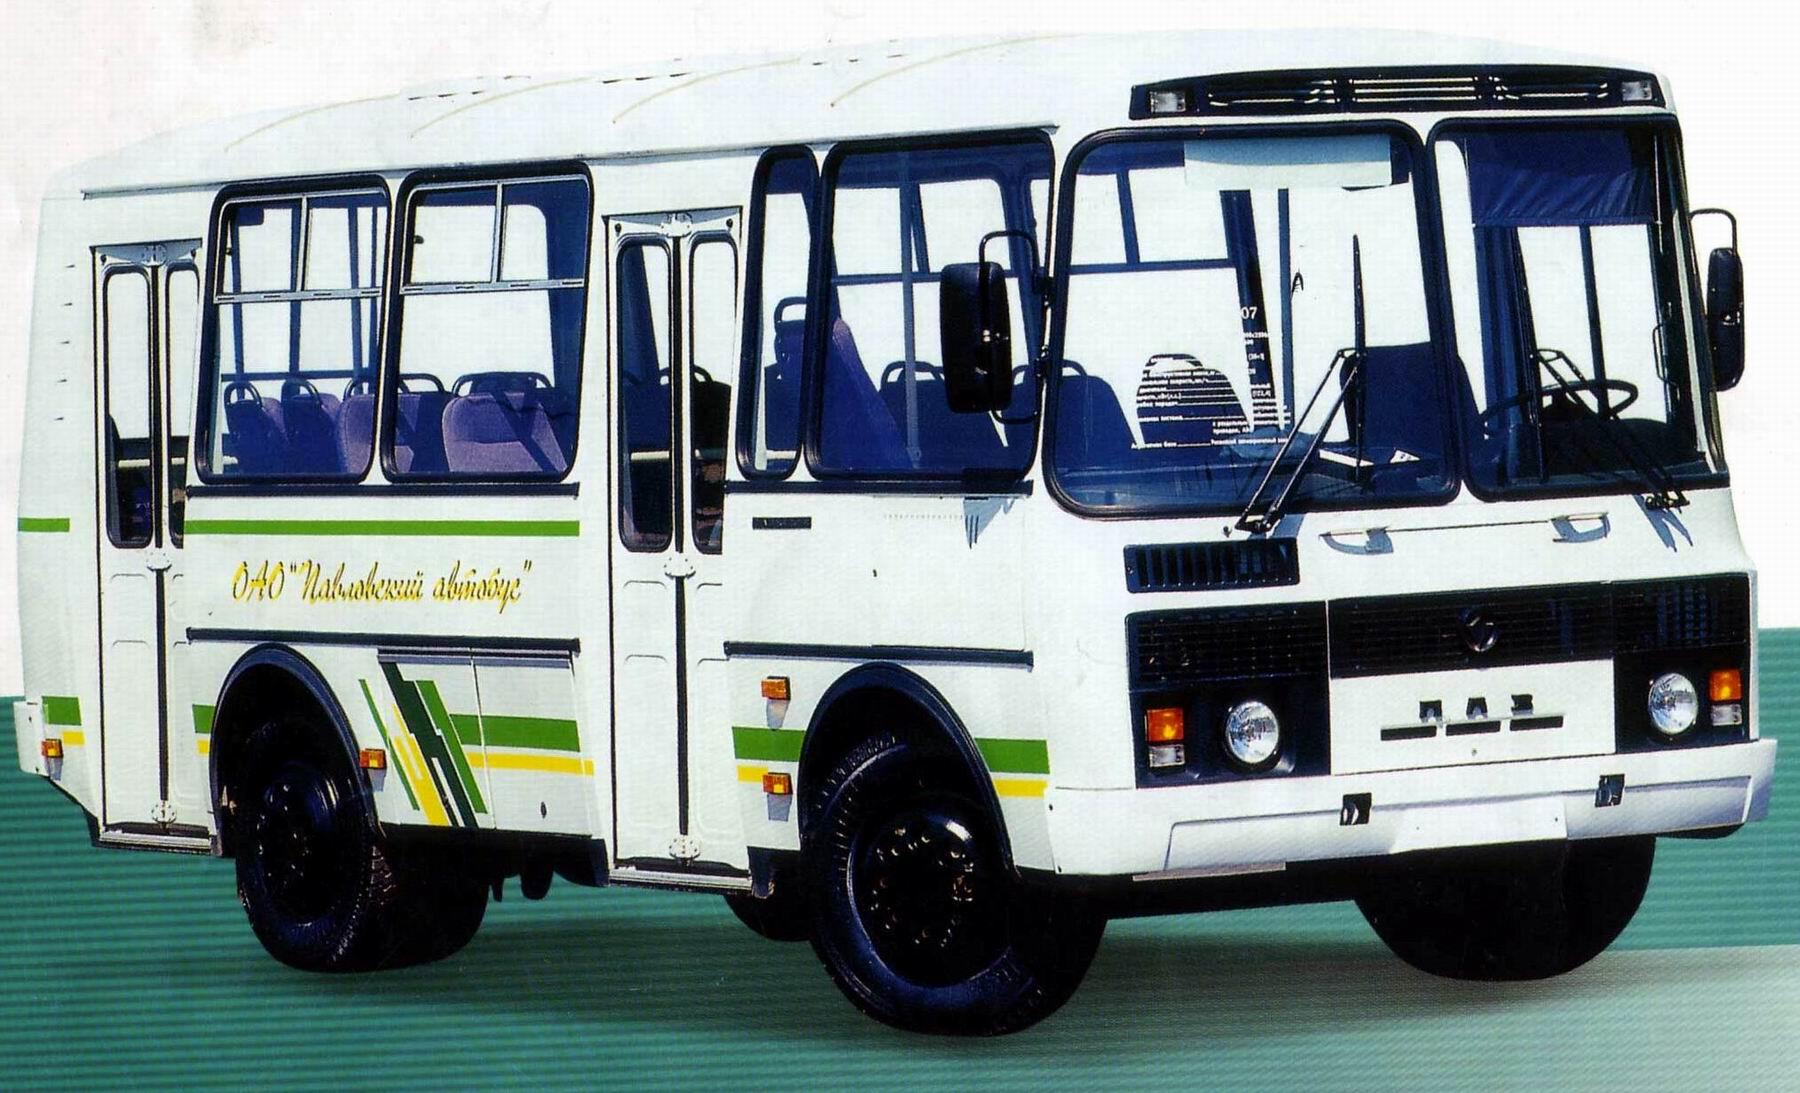 Автобус ПАЗ - расшифровка названия и история бренда